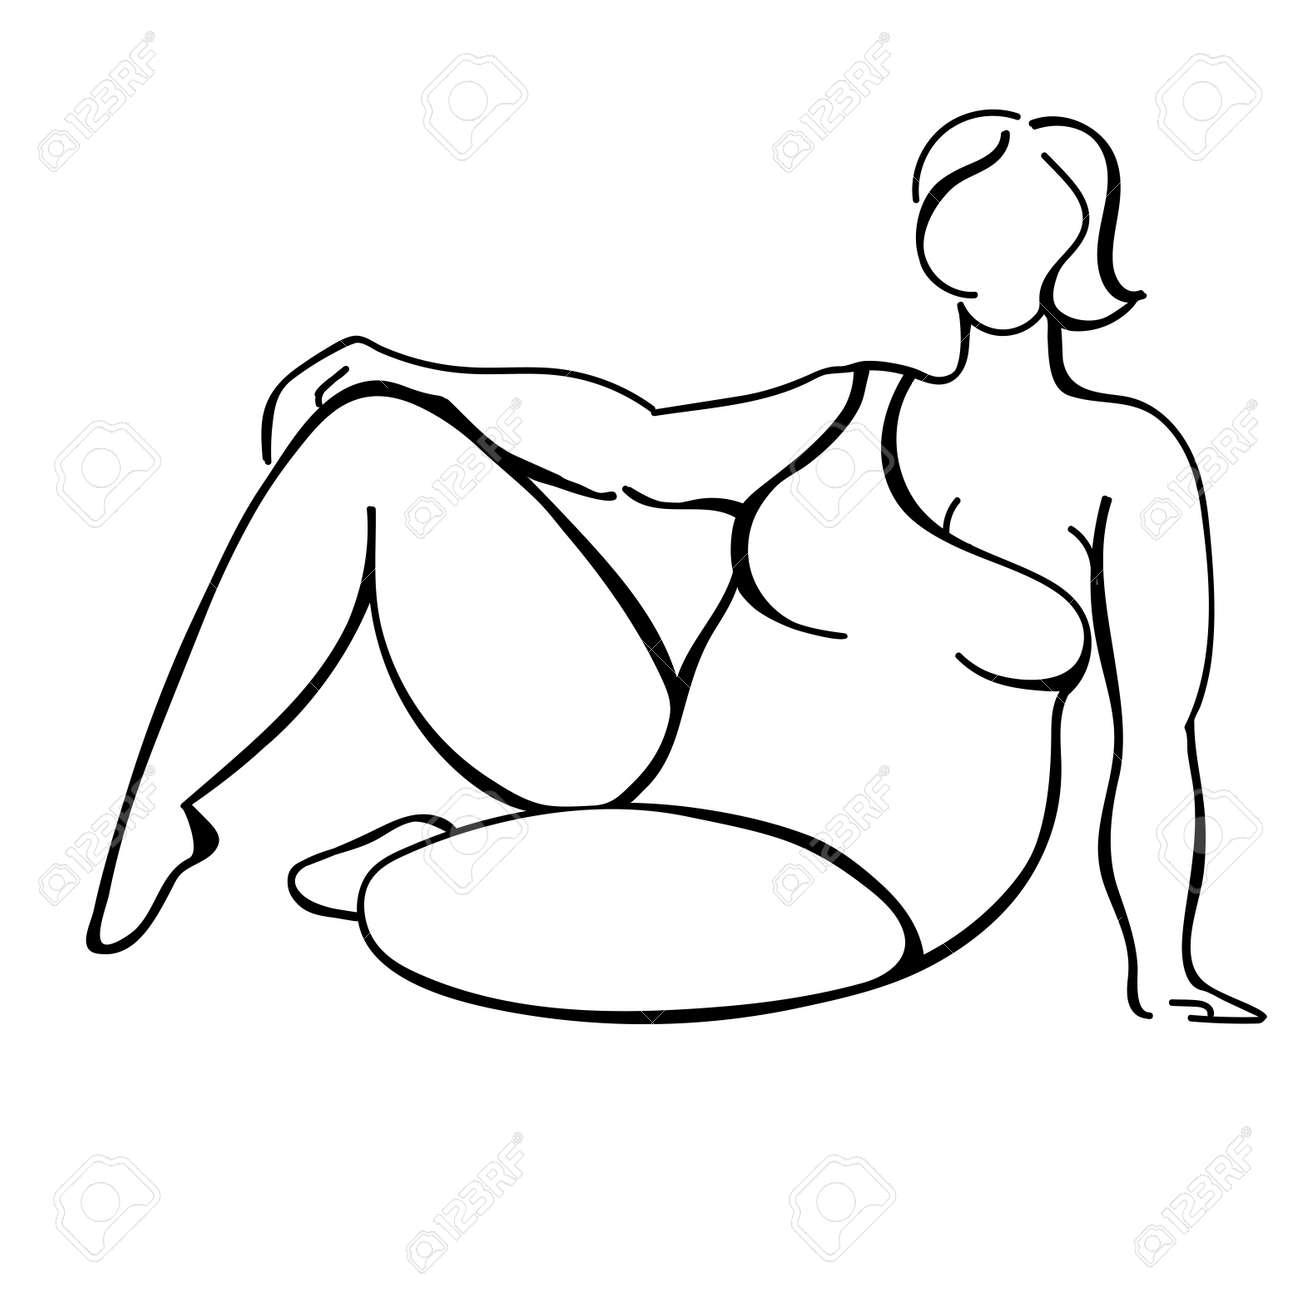 Black line woman sketch on white background. Body positive illustration. Plus size fachion model. - 158359162